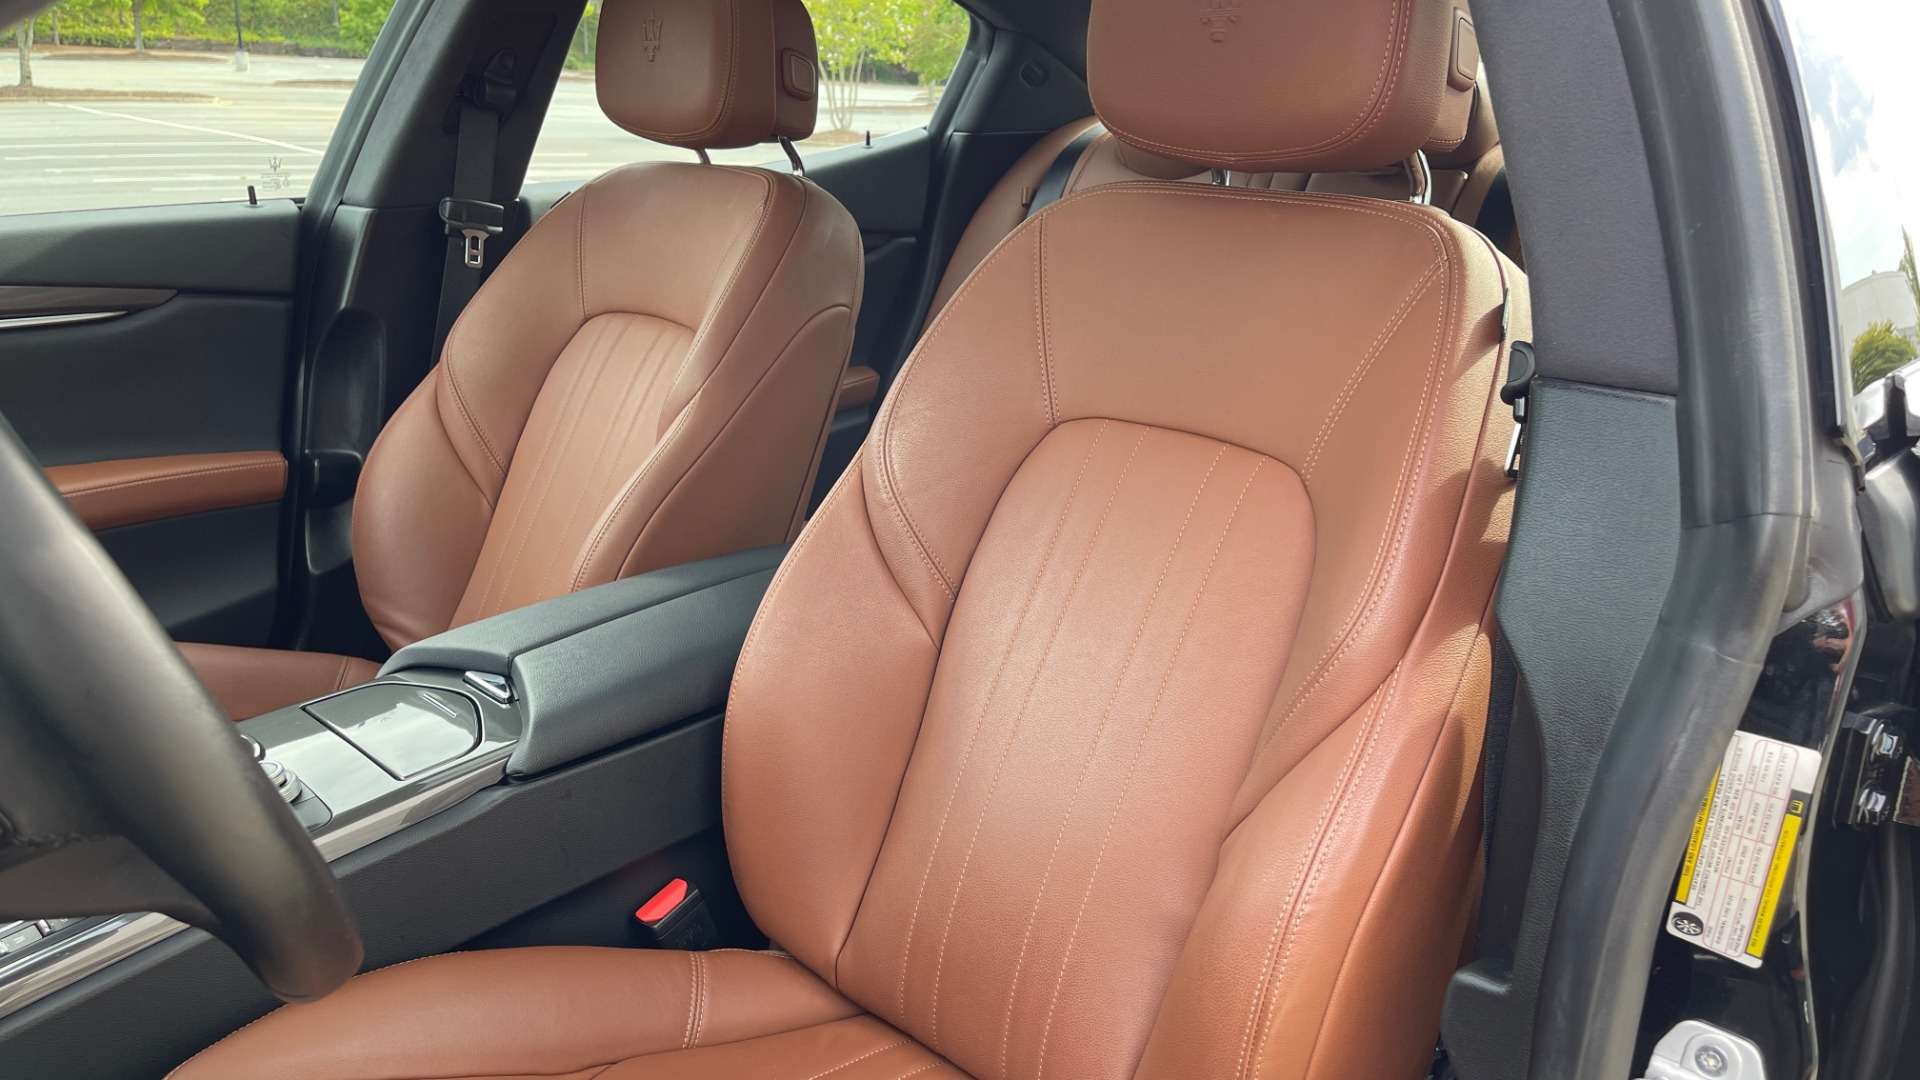 Used 2018 Maserati GHIBLI 3.0L SEDAN / 8-SPD AUTO / NAV / SUNROOF / REARVIEW for sale $42,995 at Formula Imports in Charlotte NC 28227 31